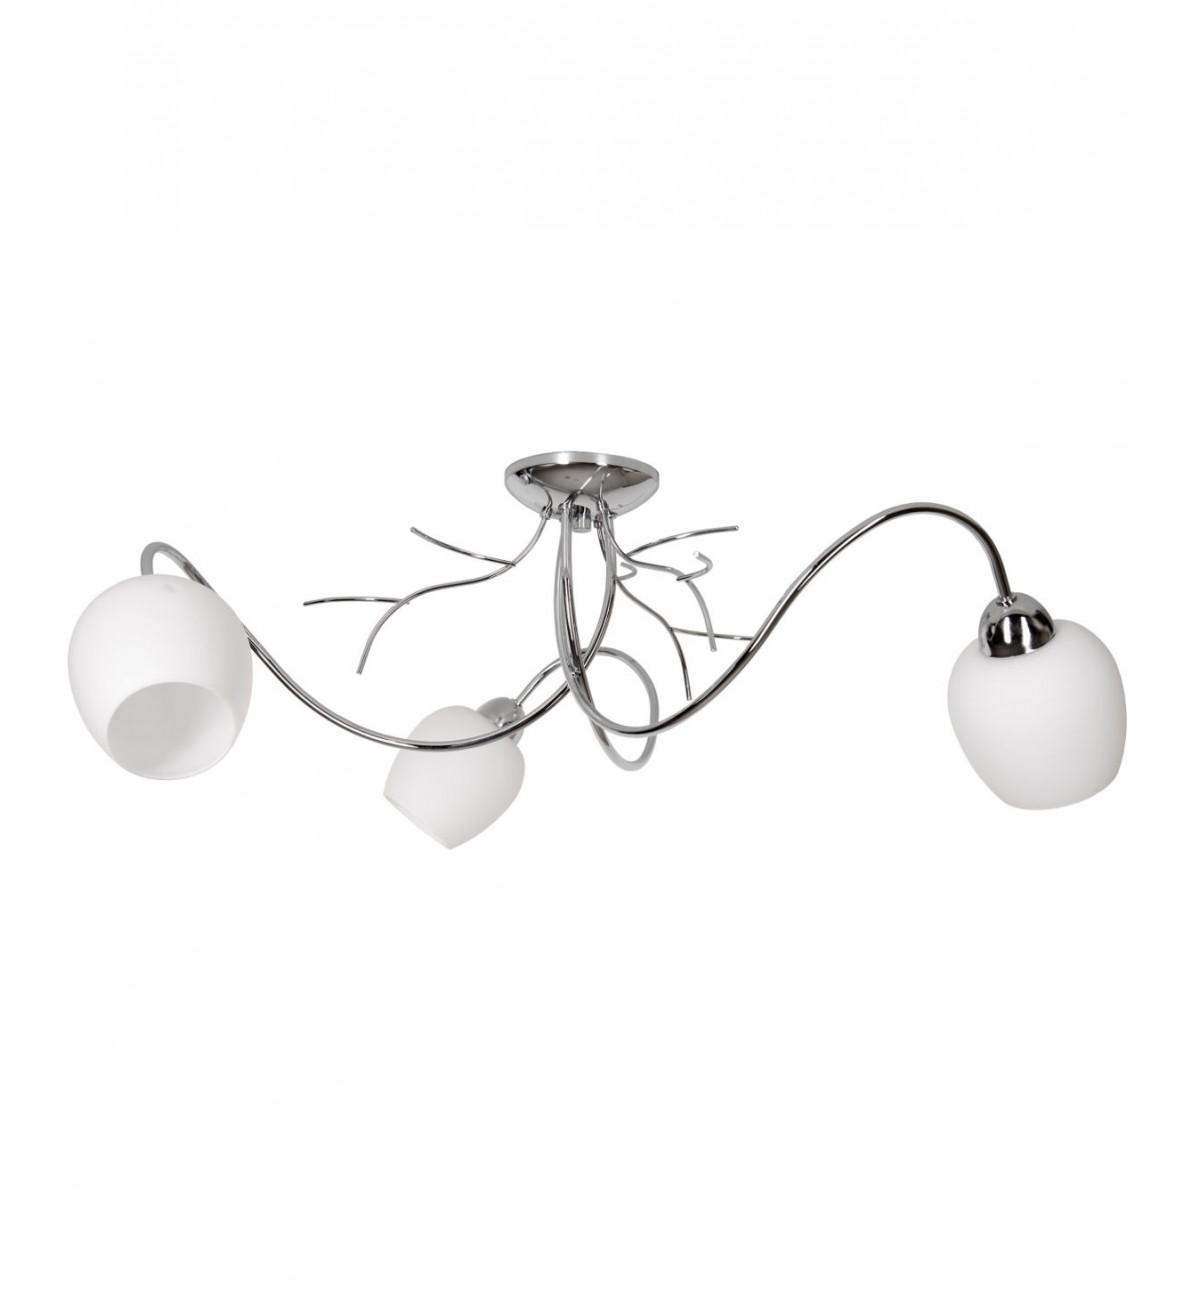 lampa wiszaca chrom 06